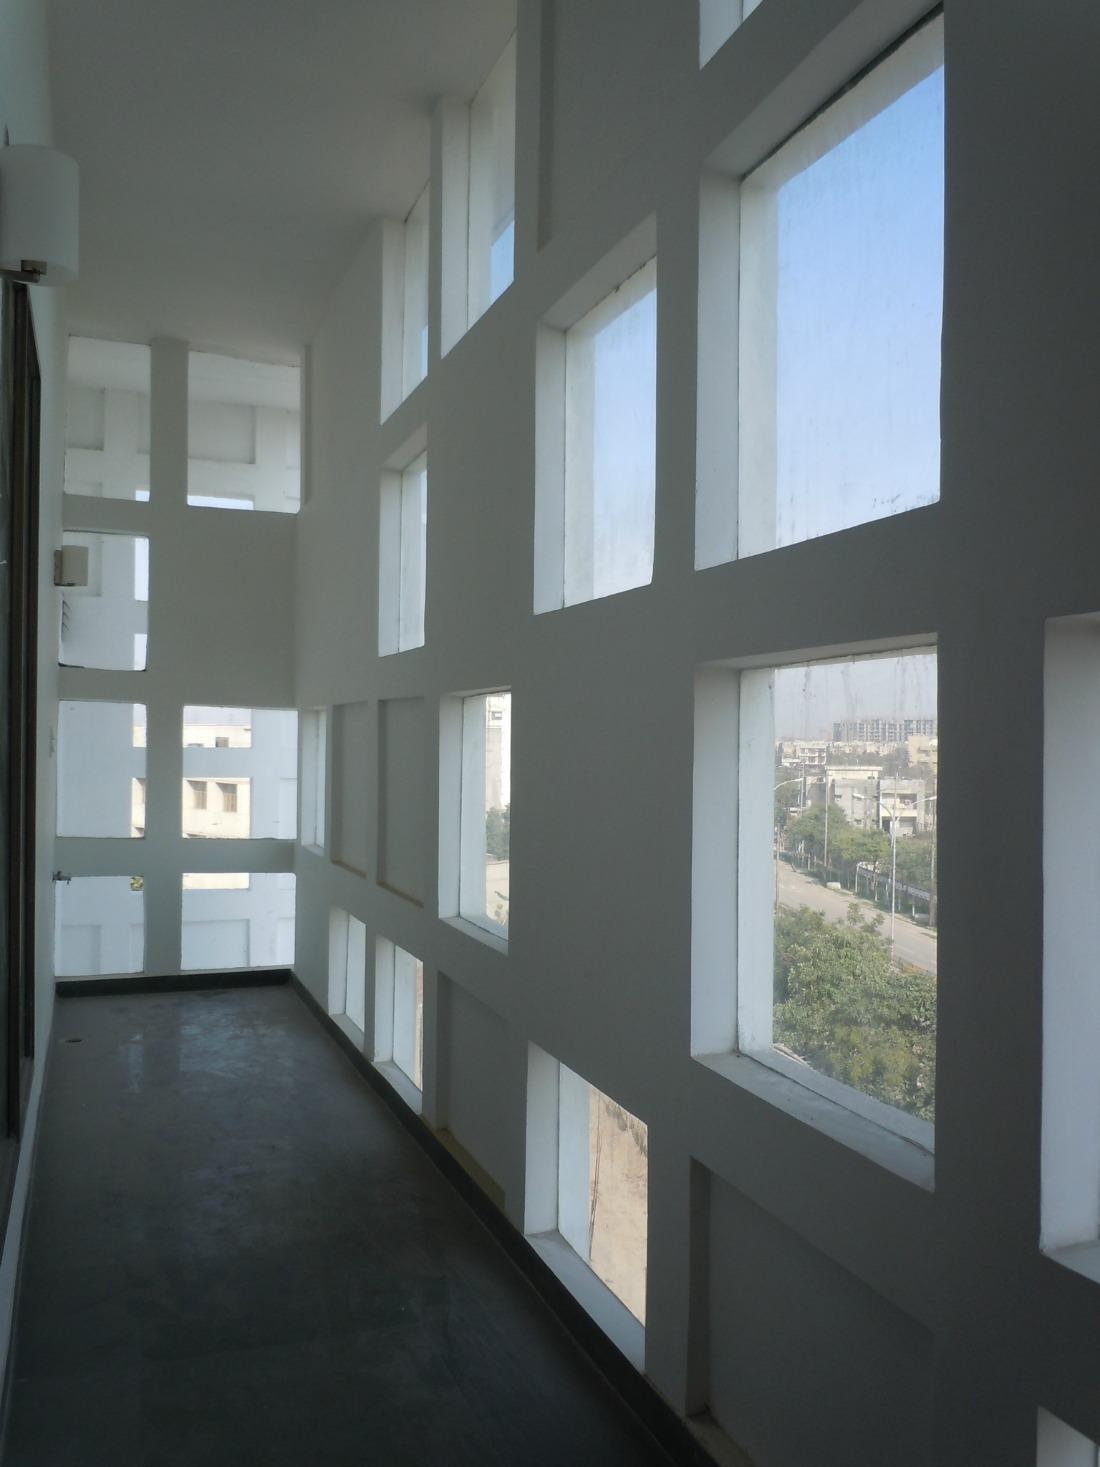 archiopteryx-hospital-architecture-noida-india